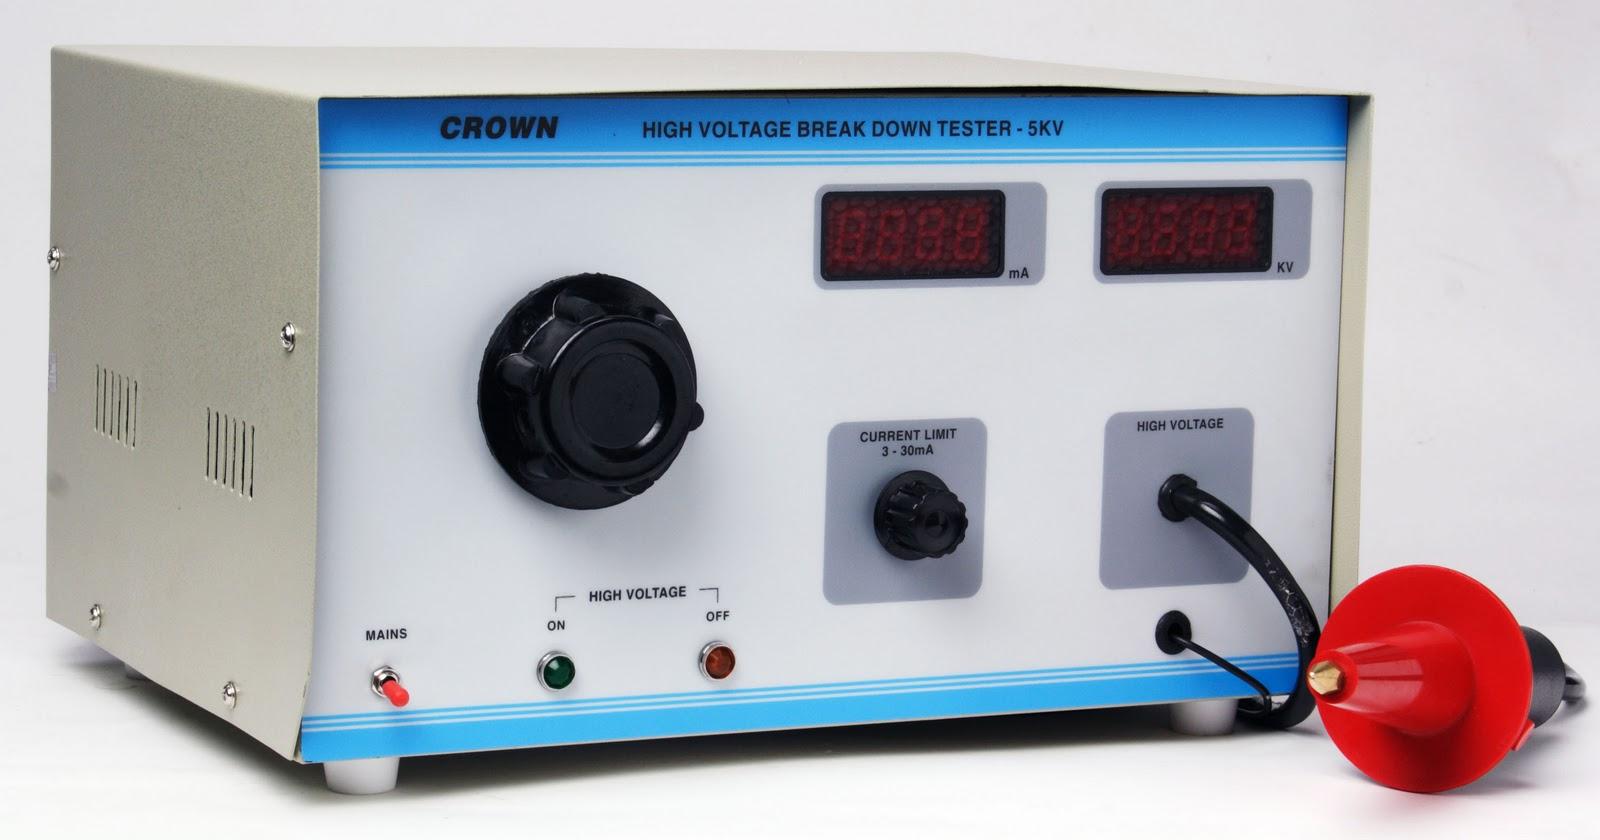 High Voltage Tester Manufacturers : High voltage breakdown tester manufacturers rajasthan